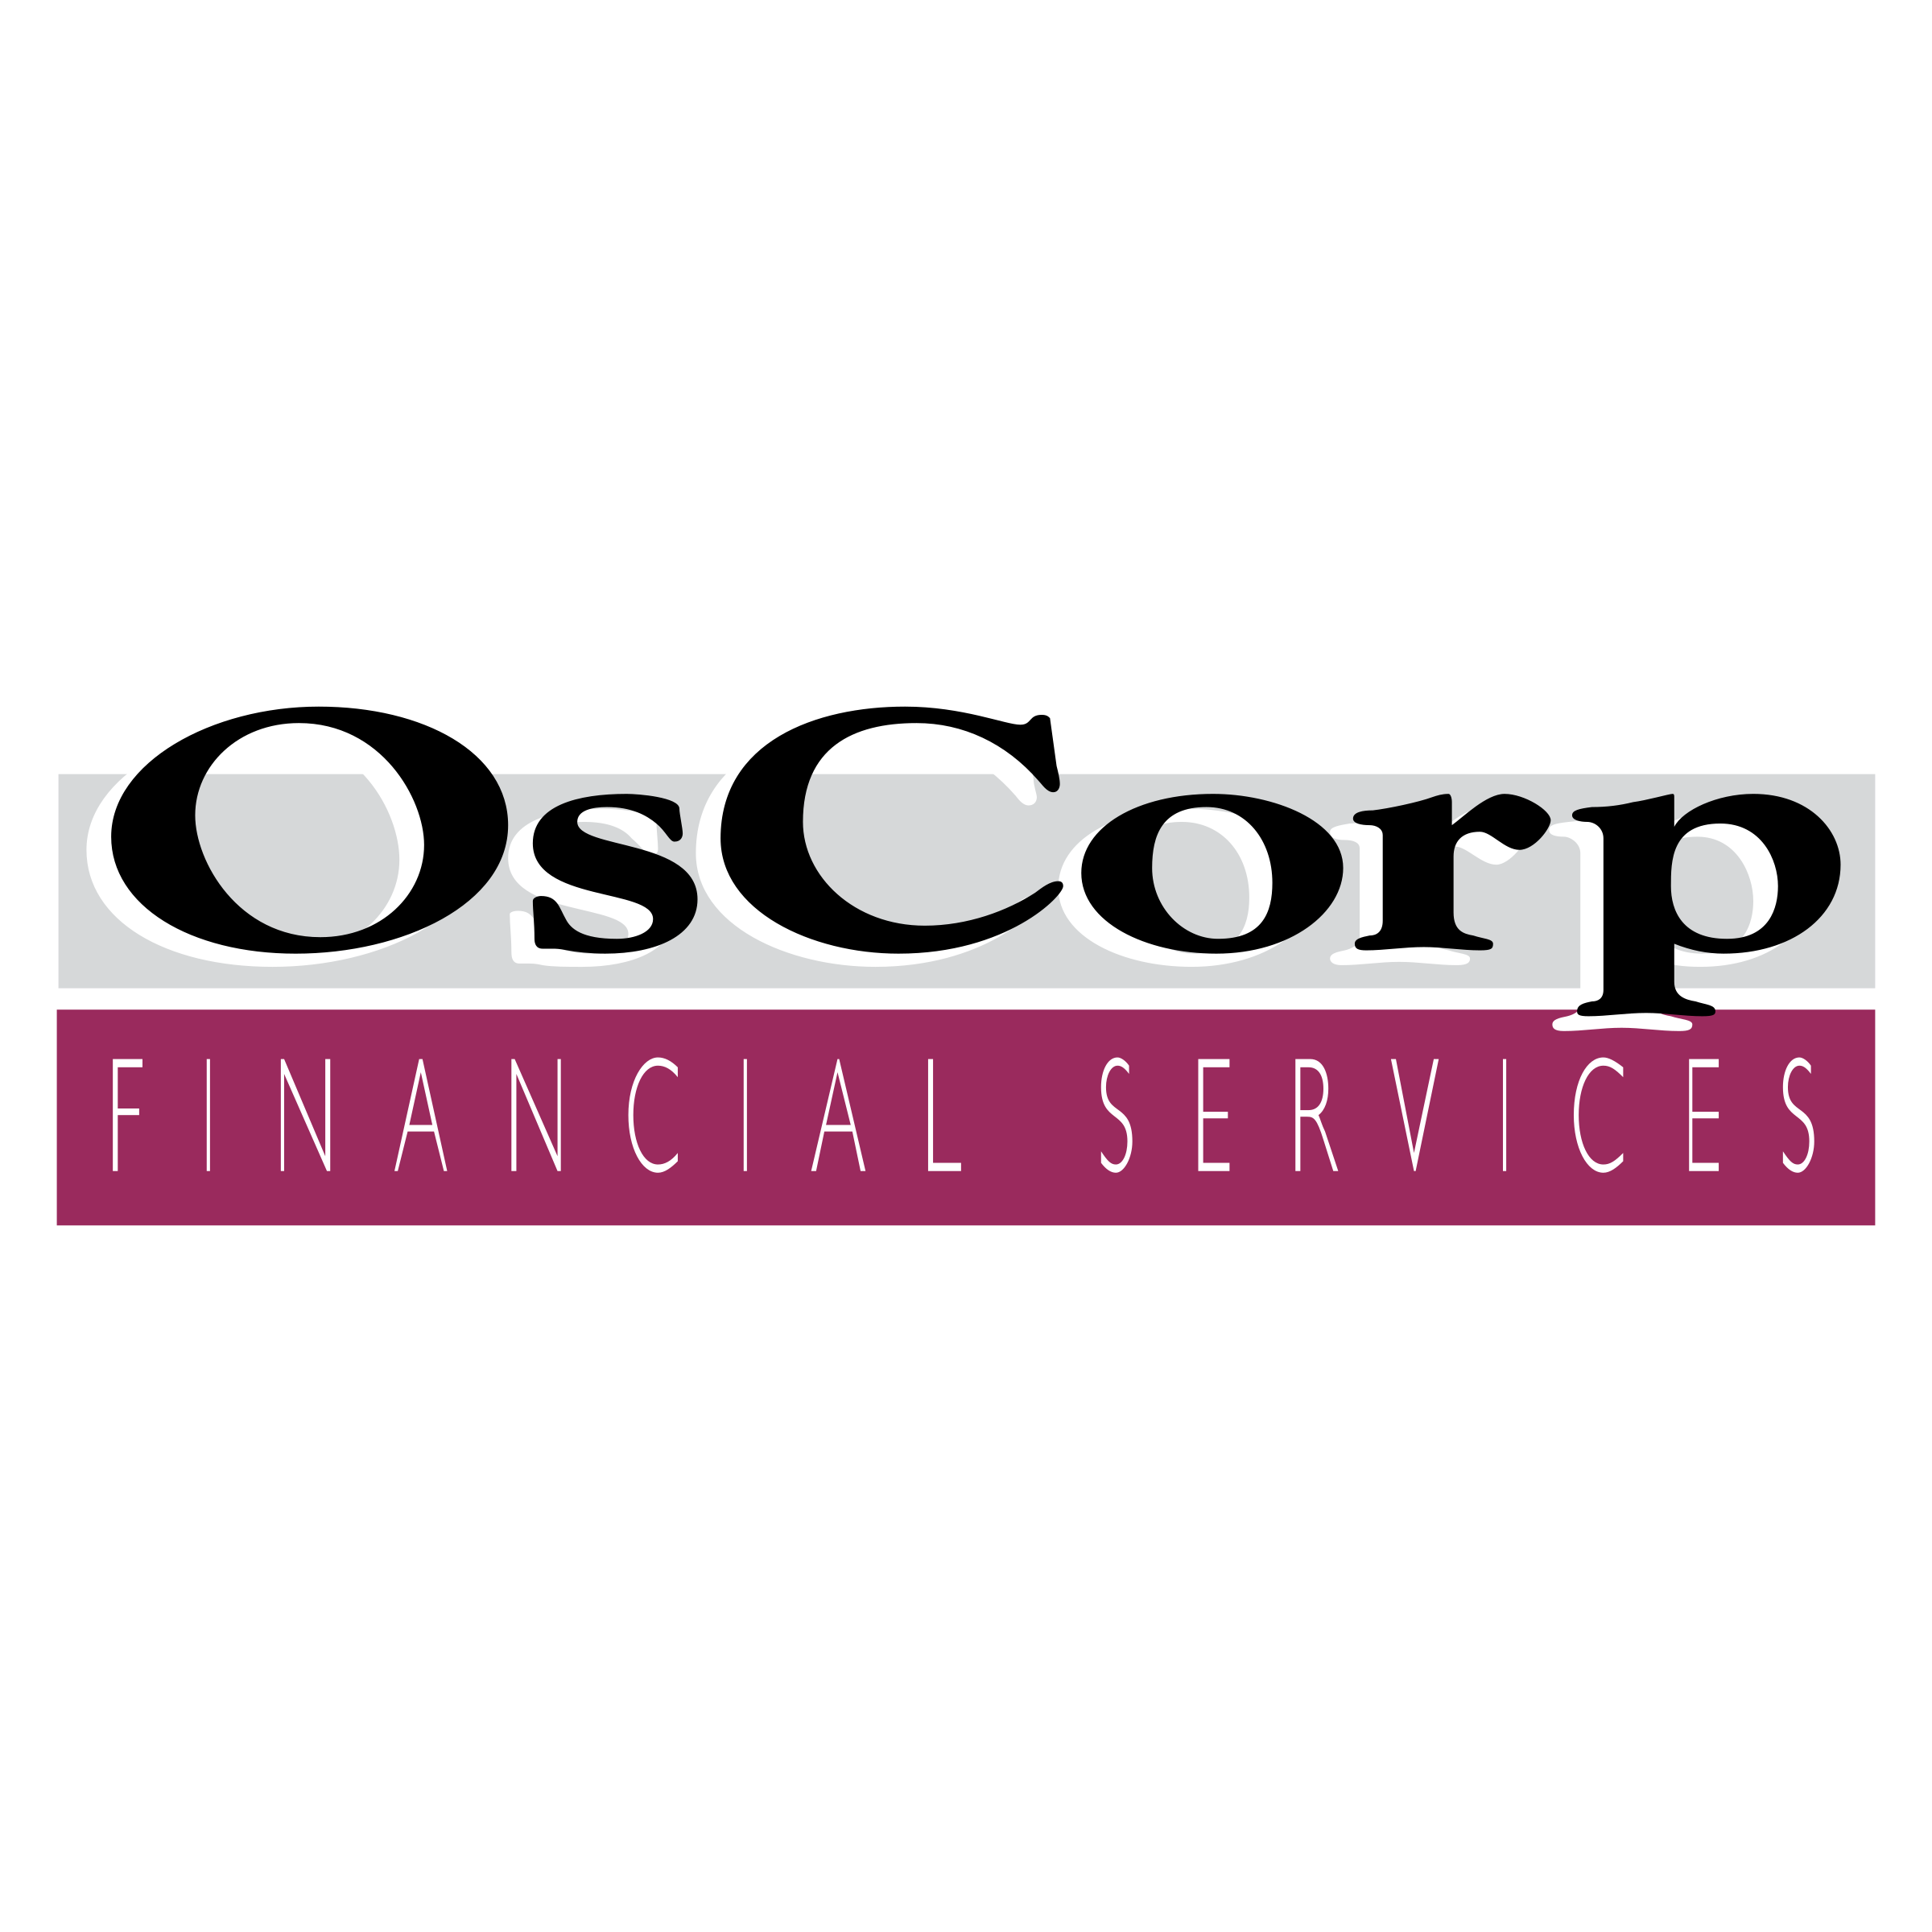 OsCorp Logo PNG Transparent & SVG Vector - Freebie Supply